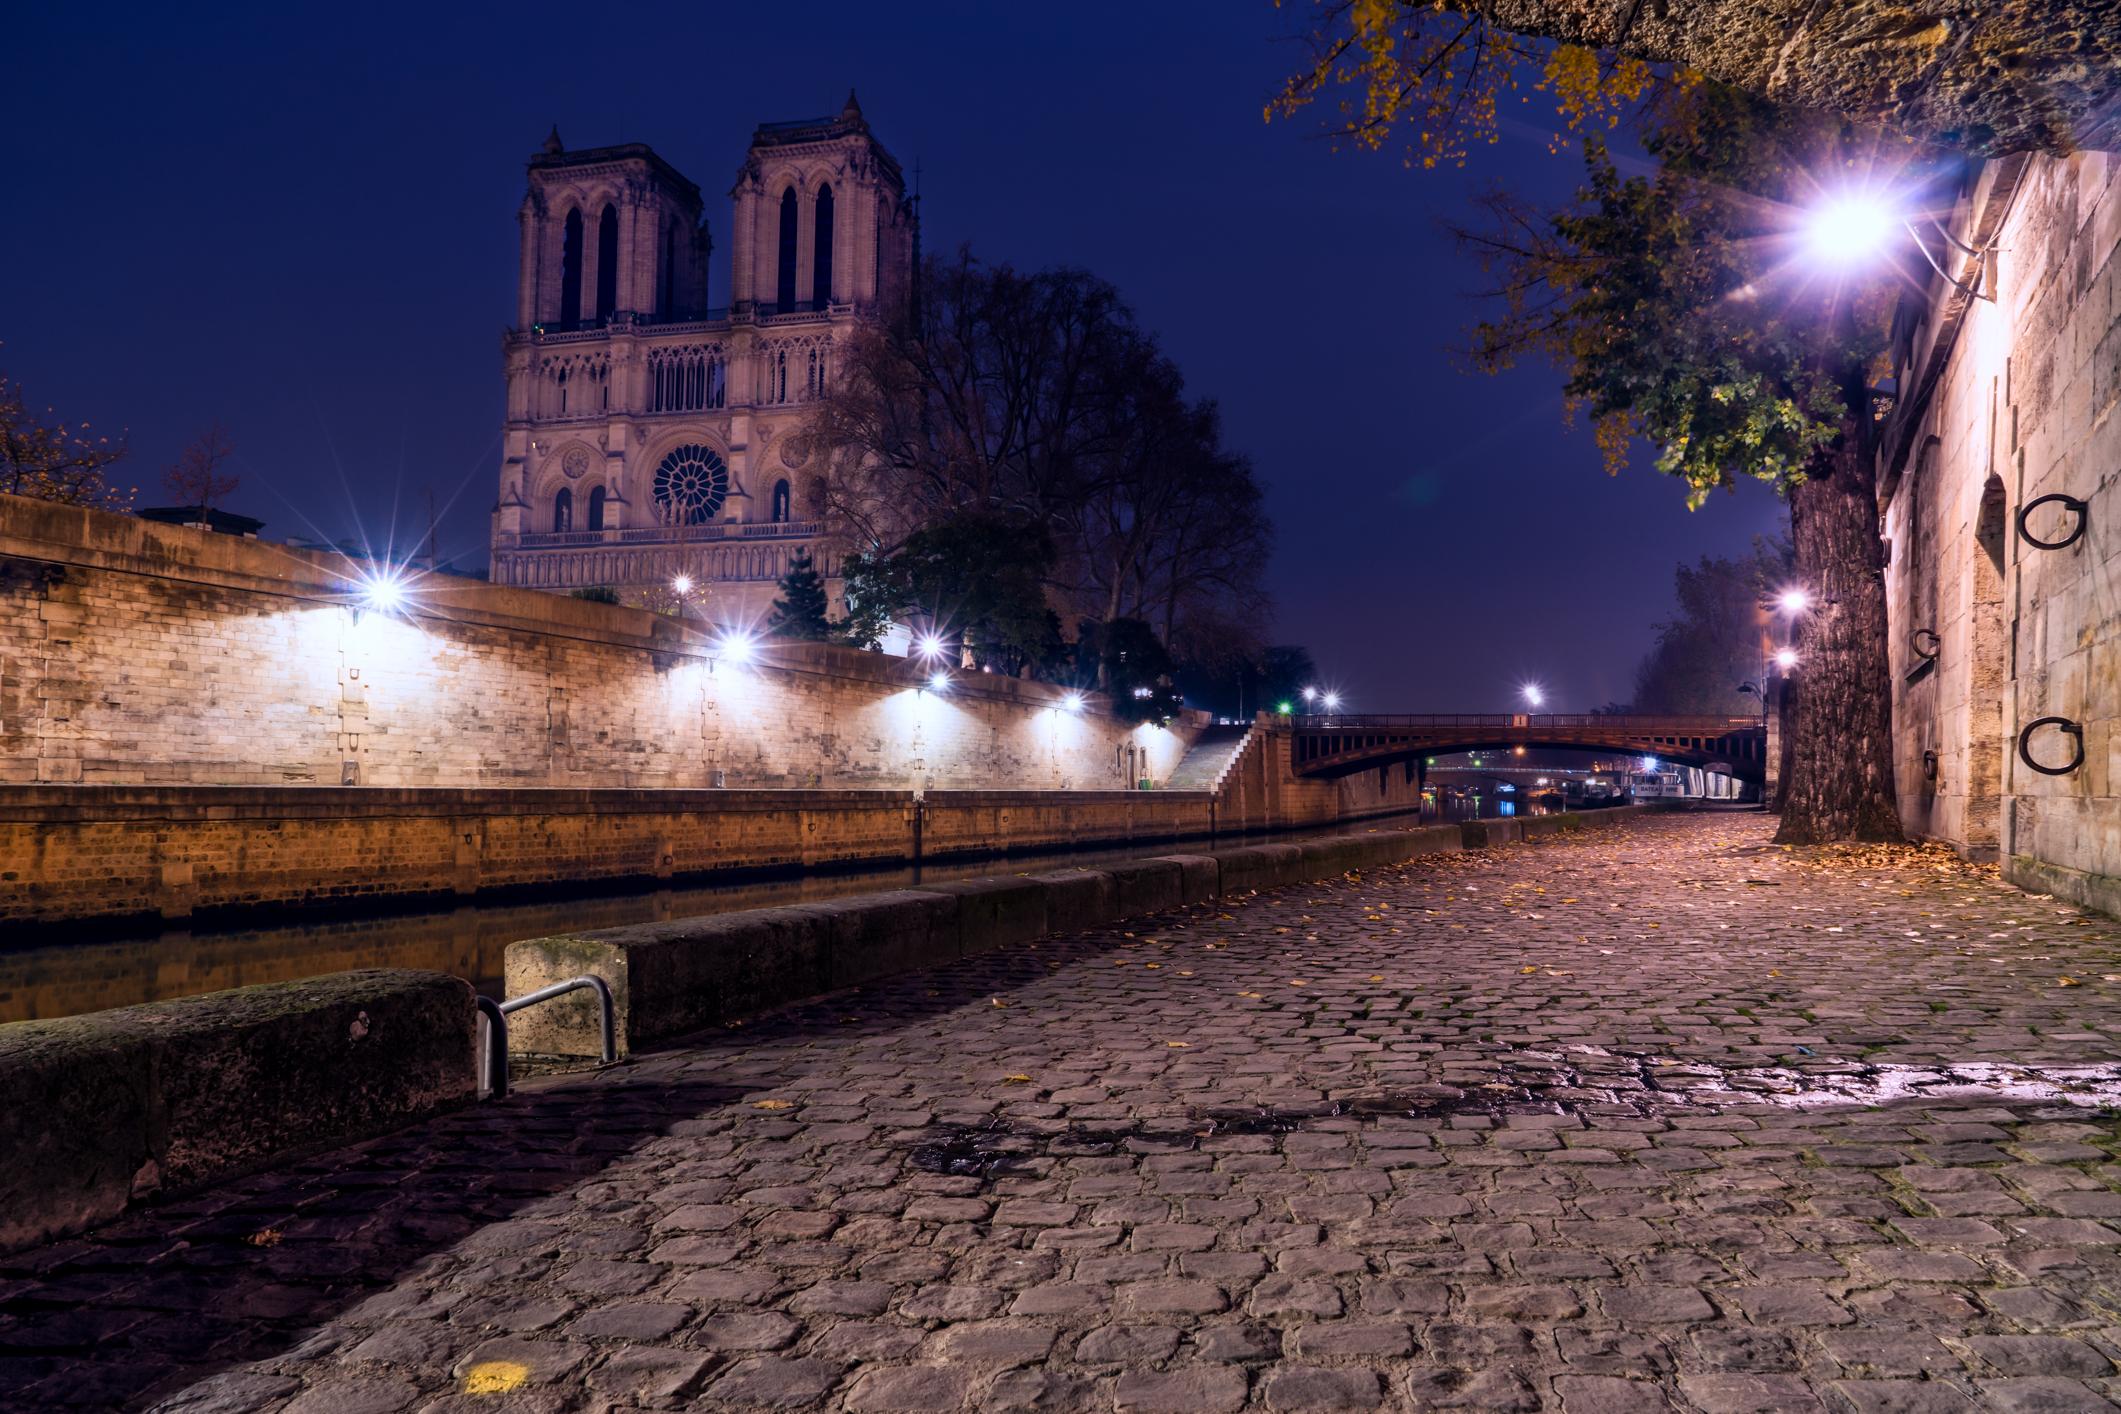 France-Paris-Notre-Dame-morning-twlight-Luminar1.jpg